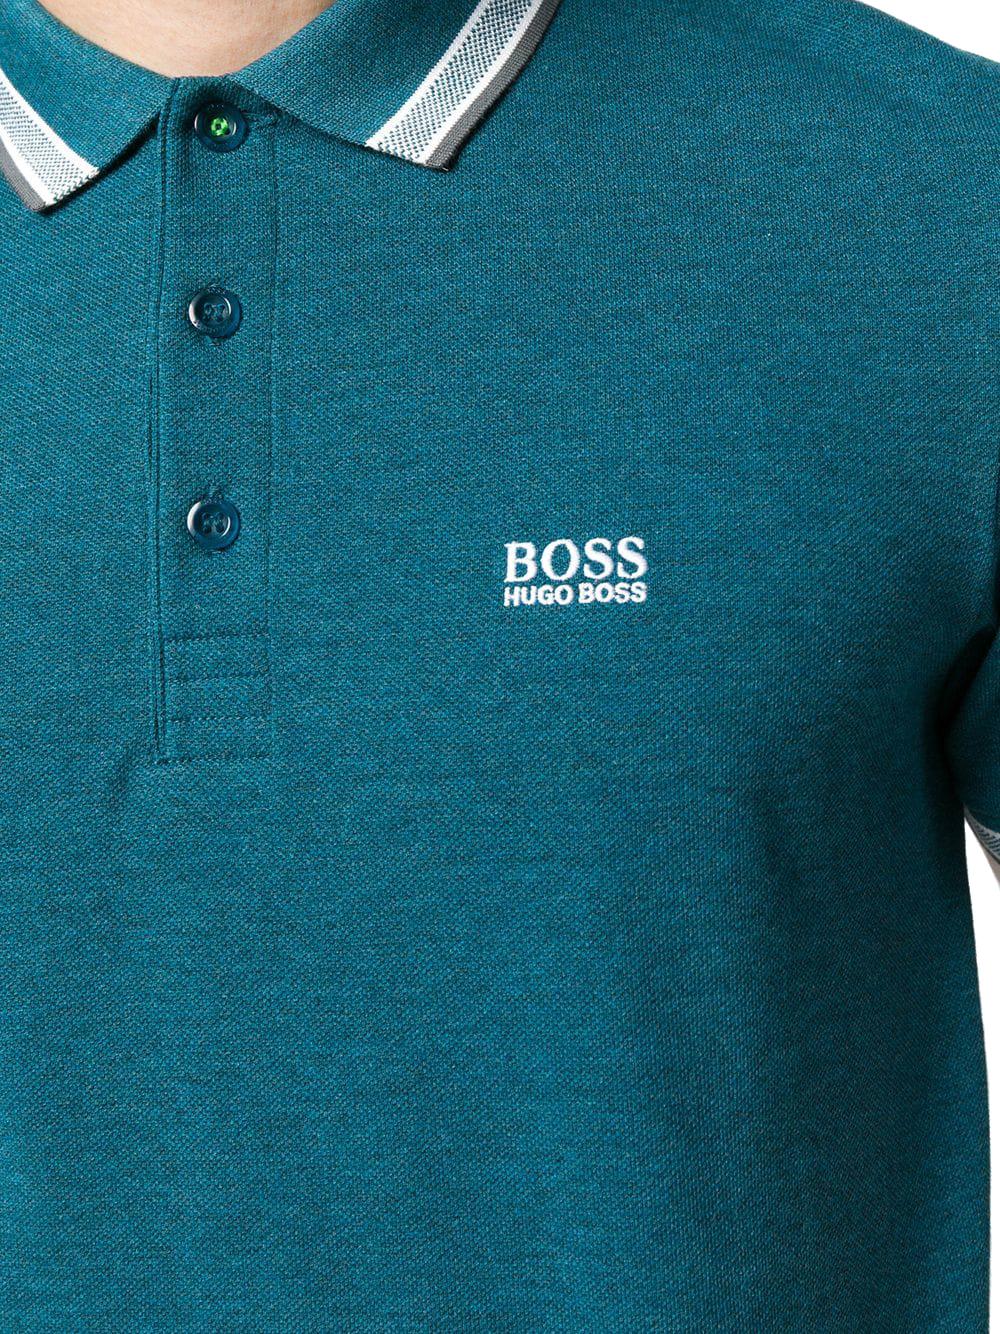 Hugo Boss Men's Premium Cotton Green Tag Sport Polo Shirt T-Shirt Paddy image 8